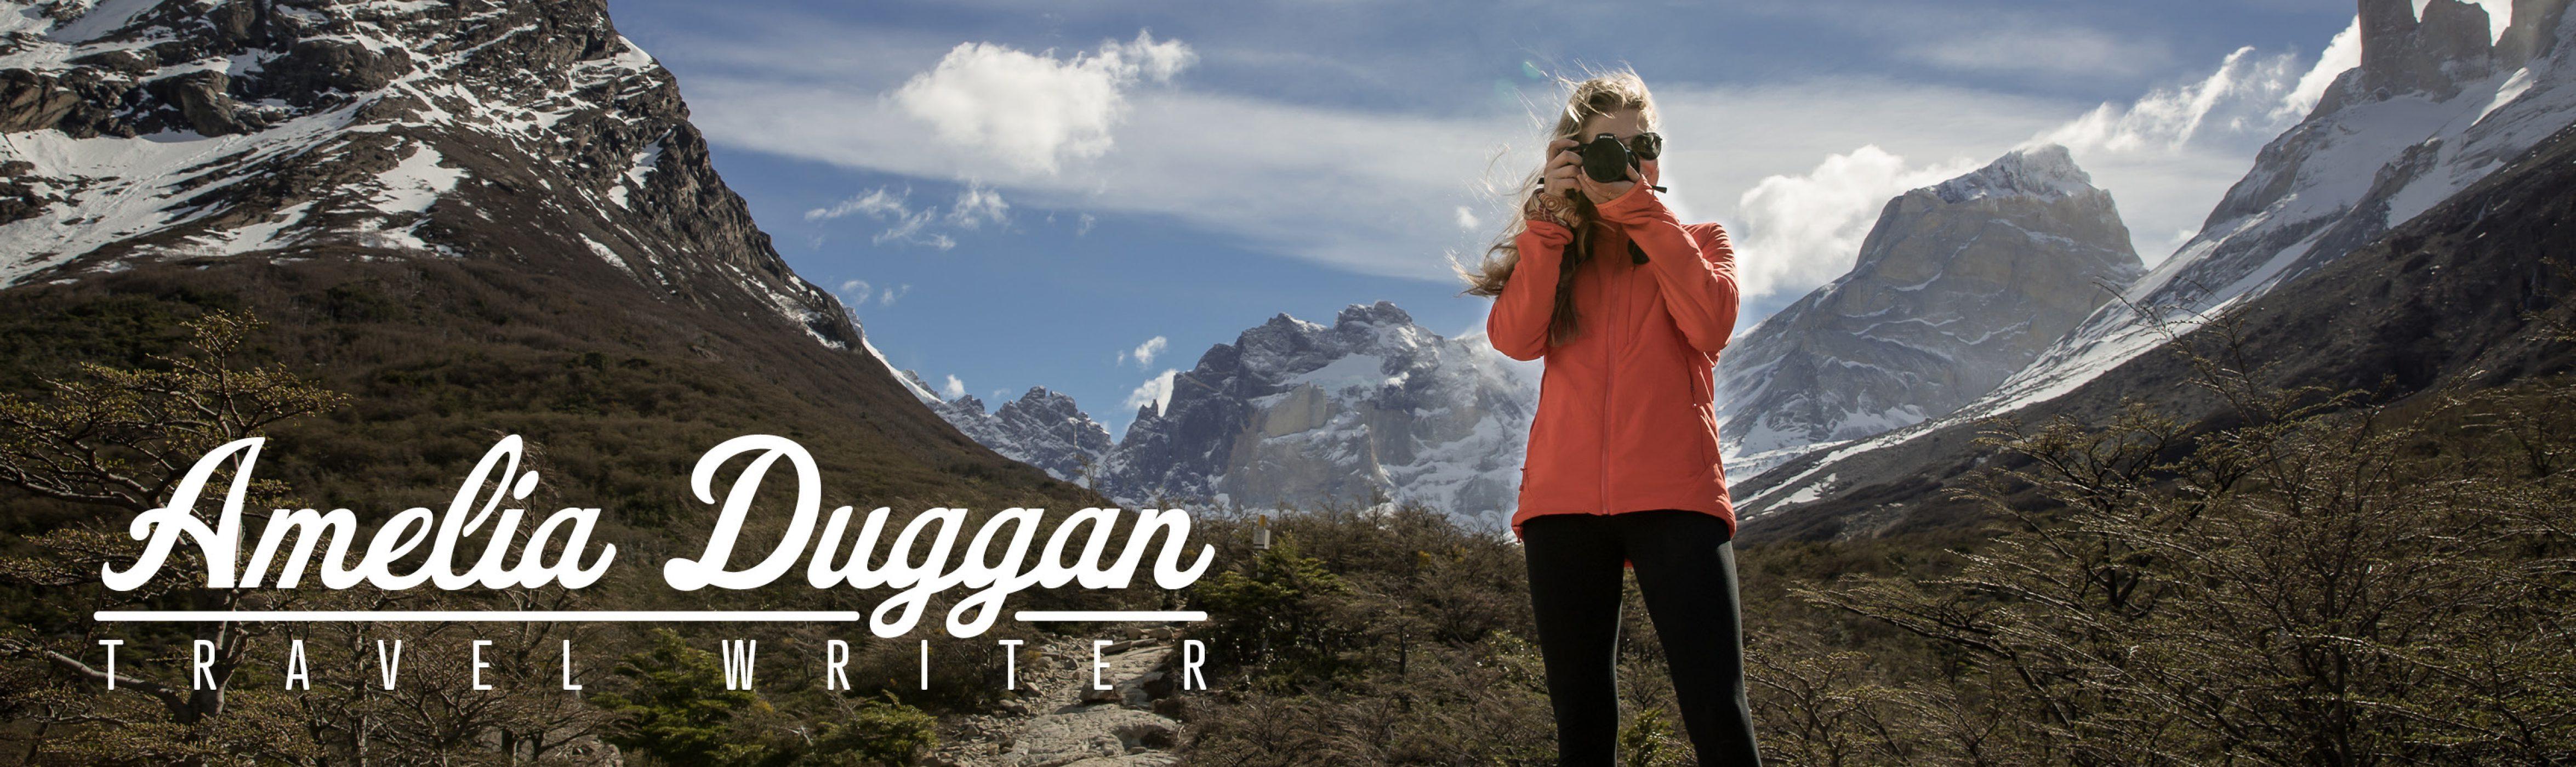 Amelia Duggan Header Image